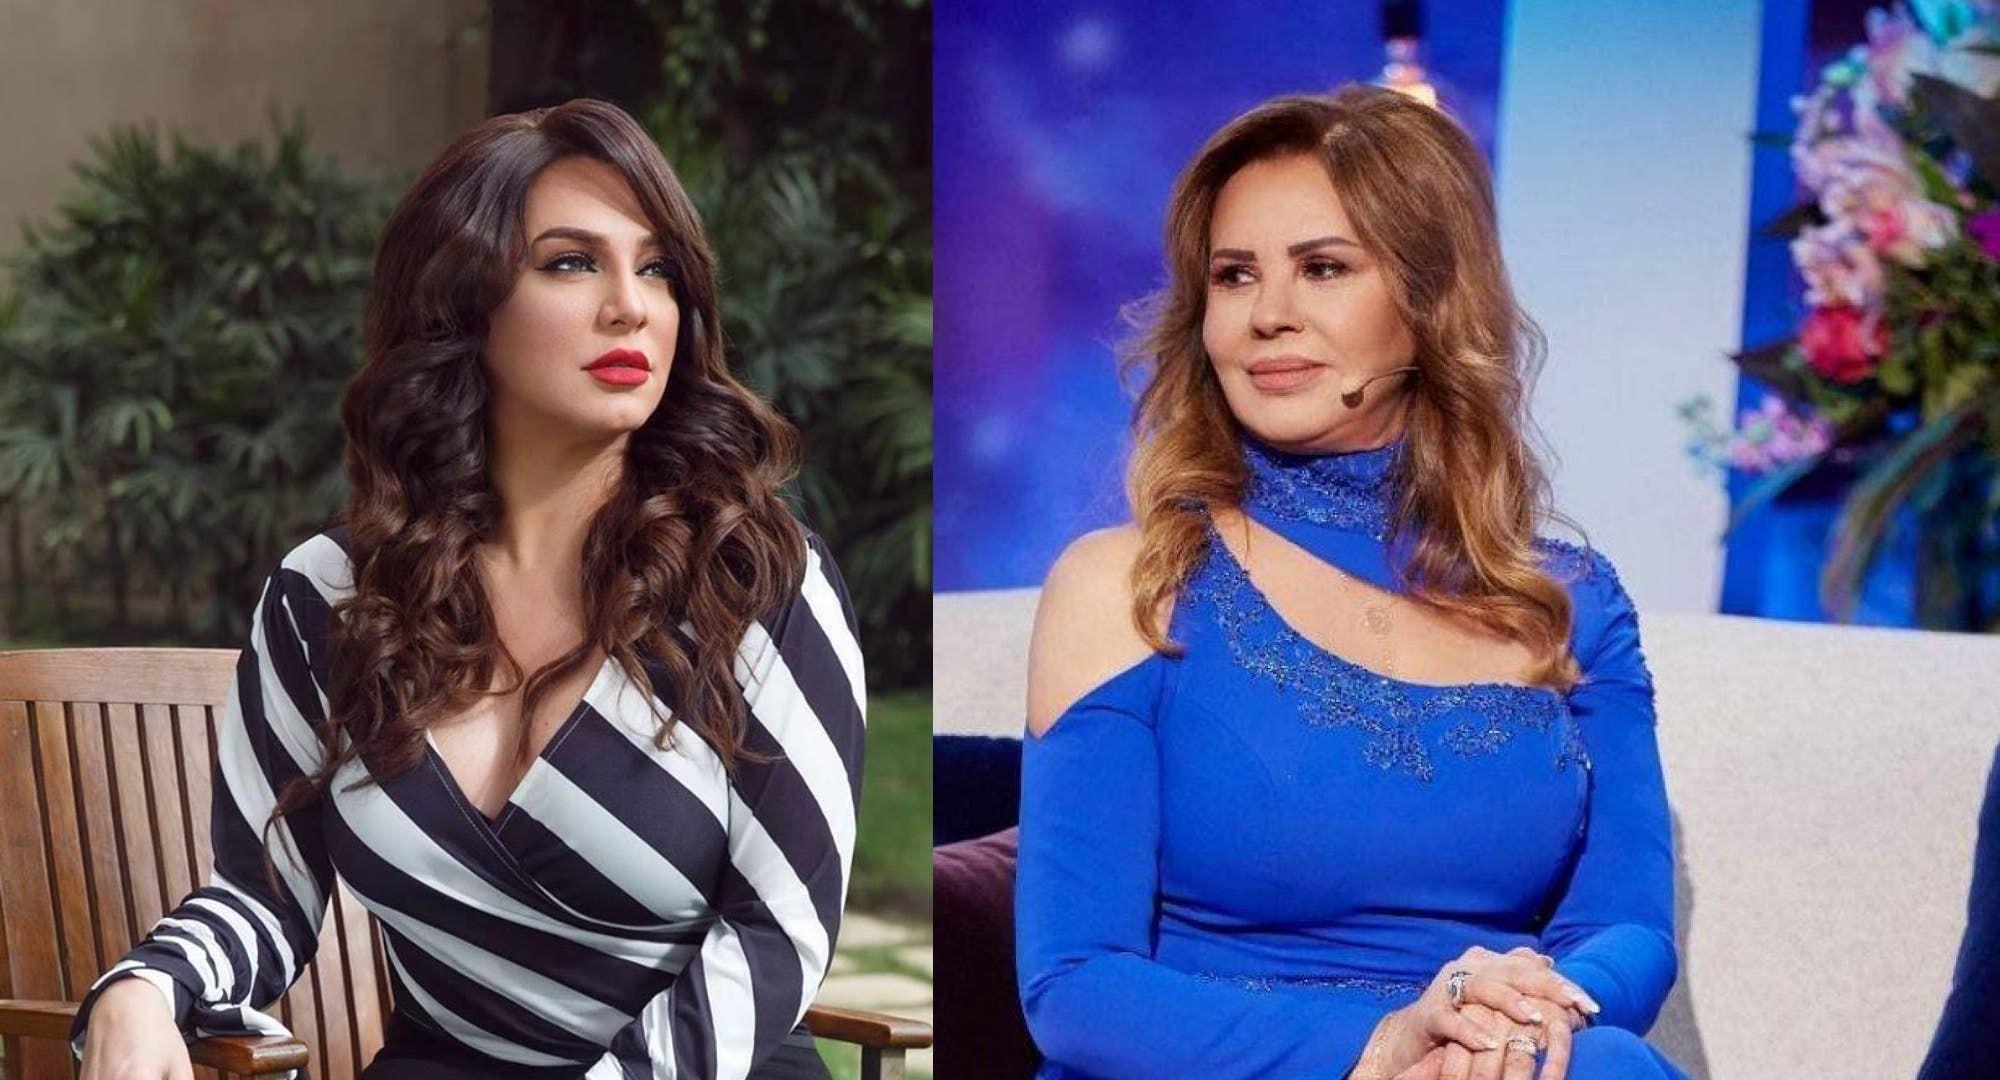 سلاف فواخرجي بشورت قصير إلى جانب سلمى المصري شاهد Open Shoulder Tops Fashion Women S Top